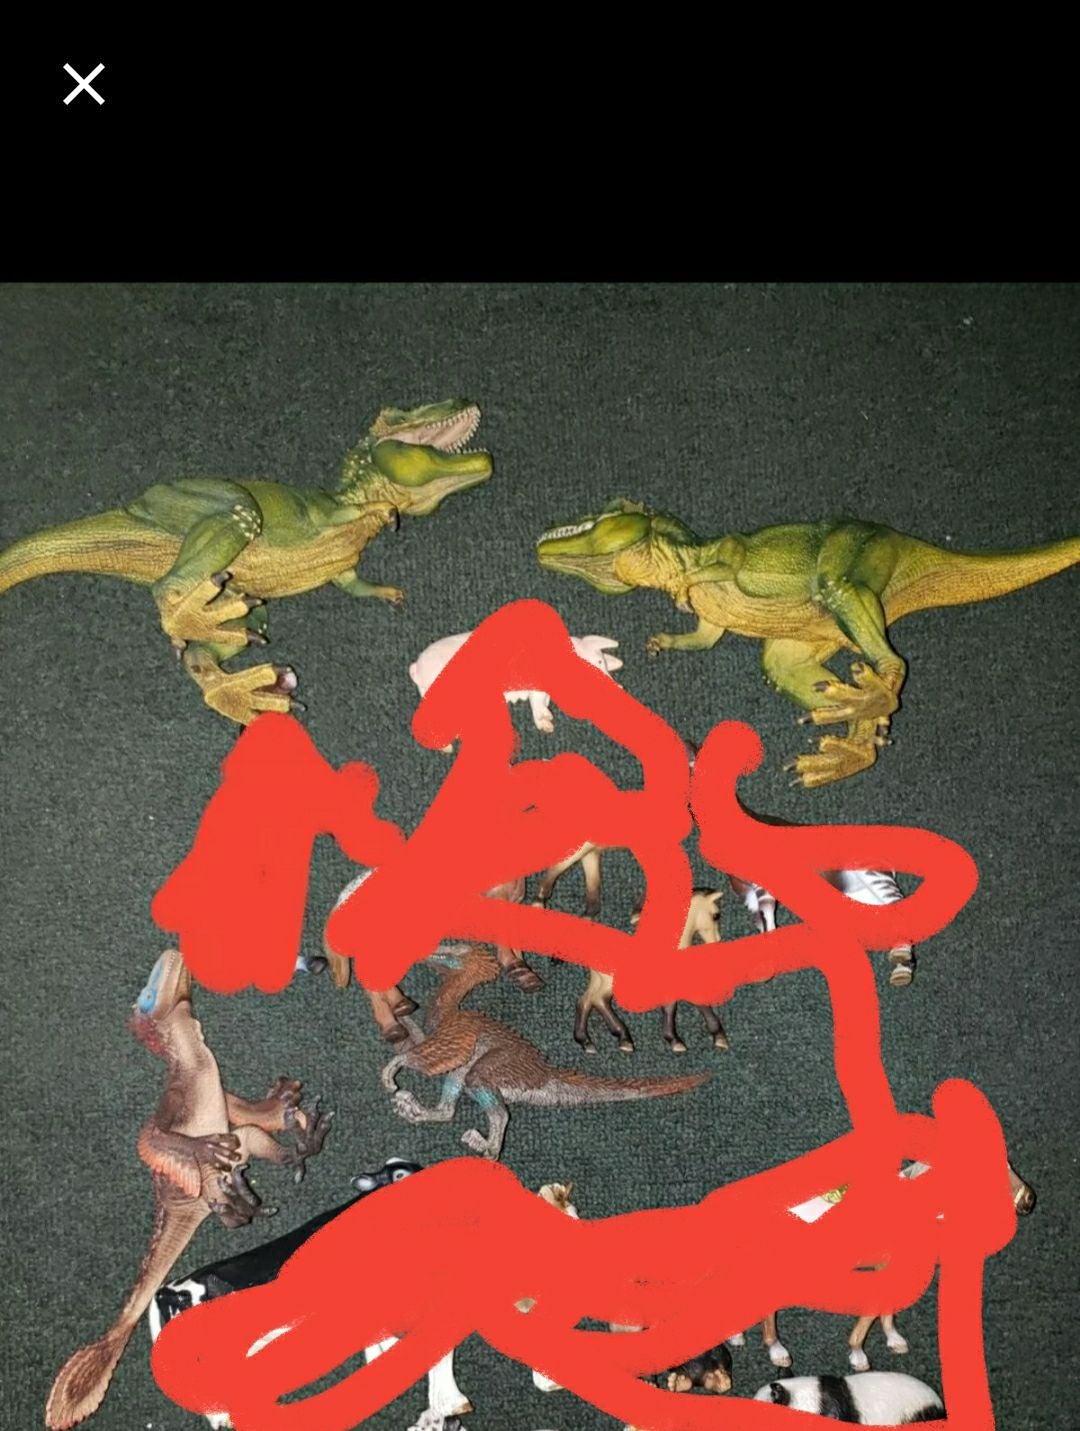 Lot of schleich animal figures 4 Dinosau